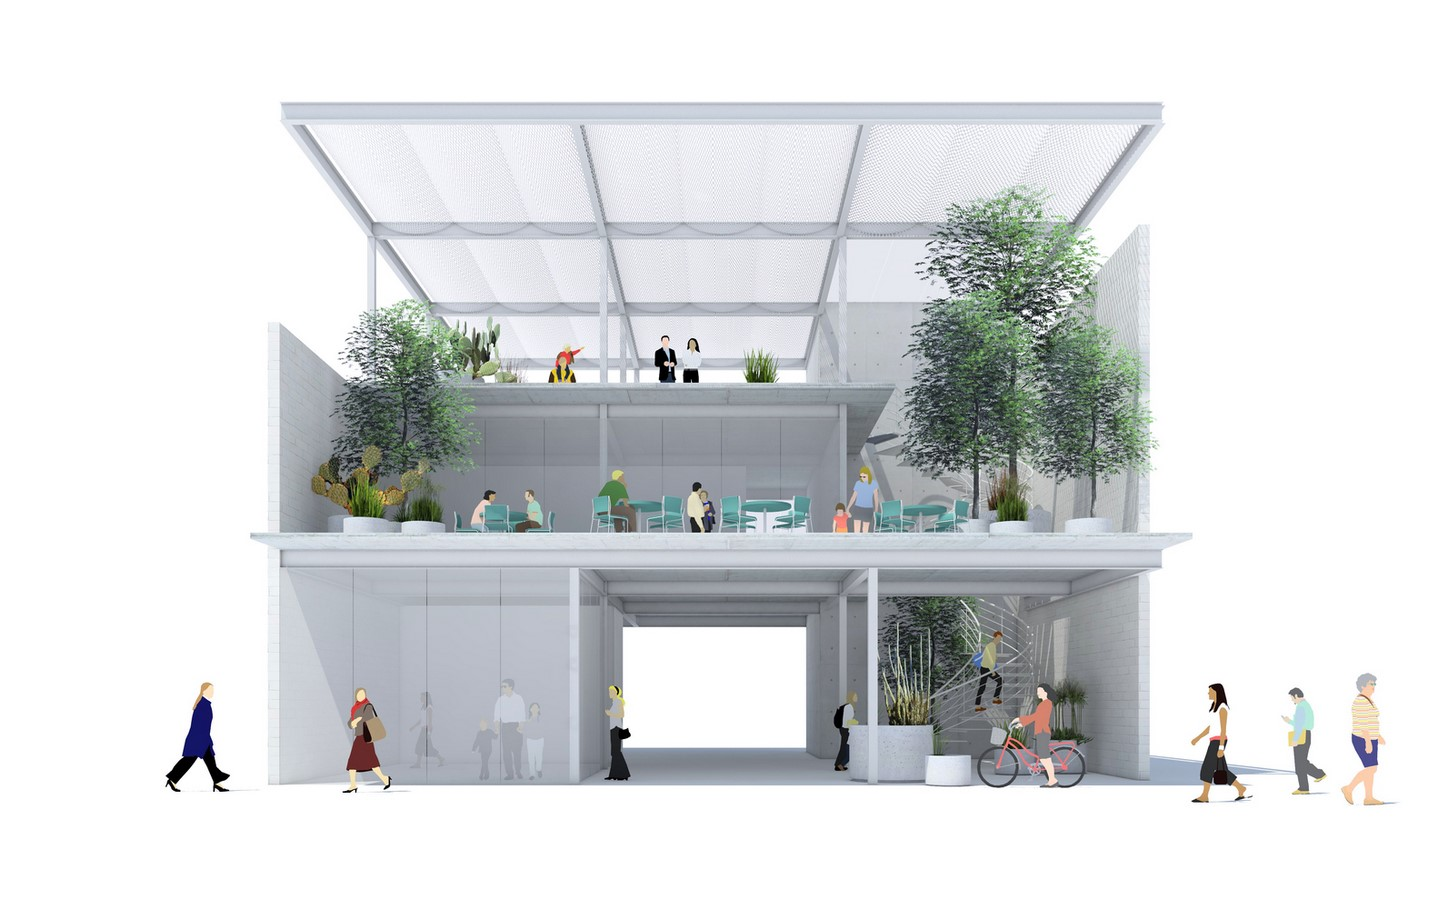 Architecture, an art of skills - Sheet1